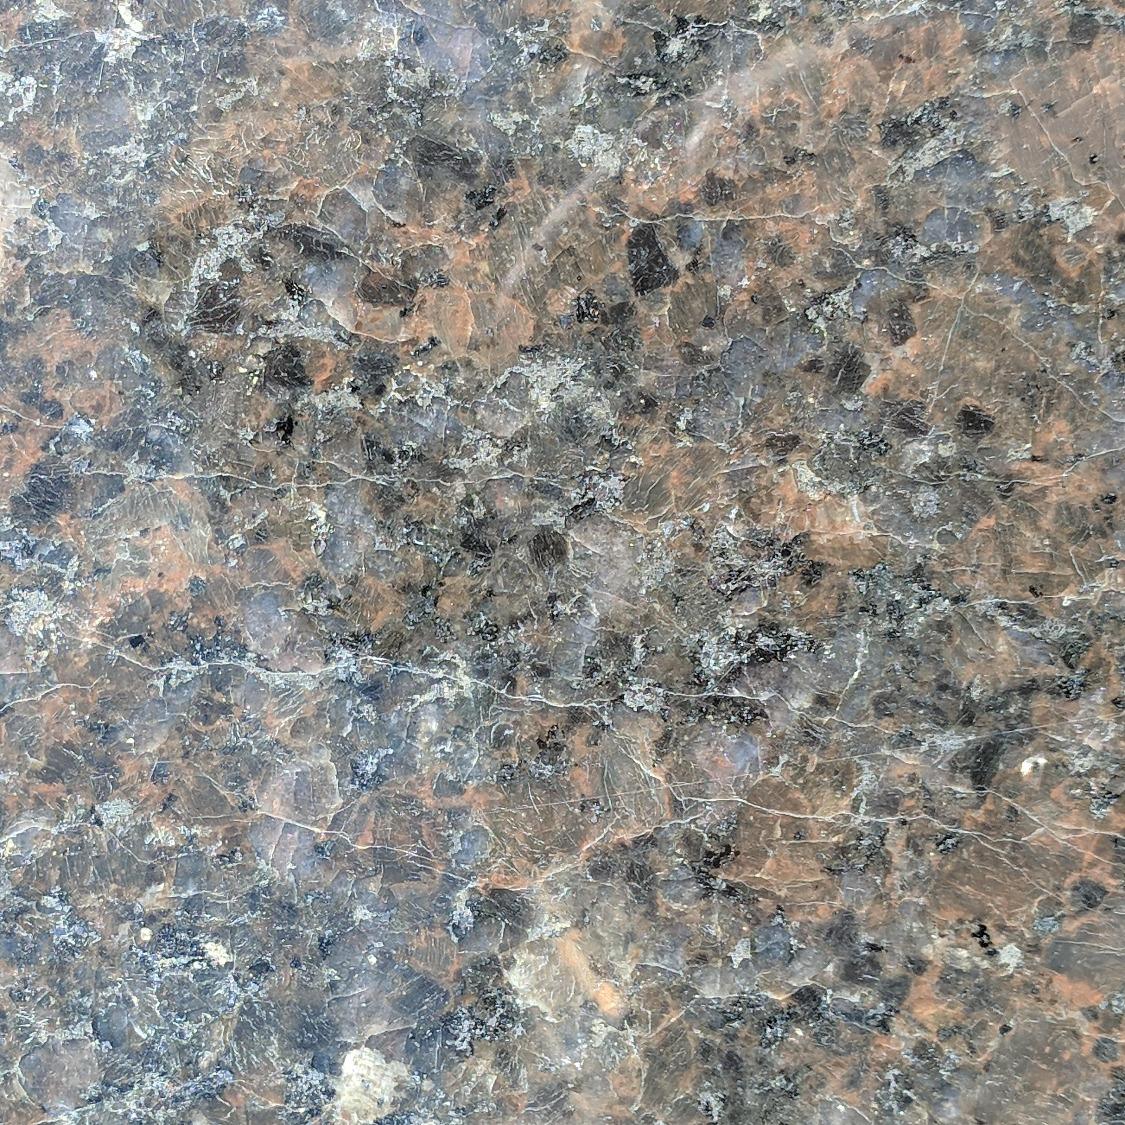 Sample Stone 1